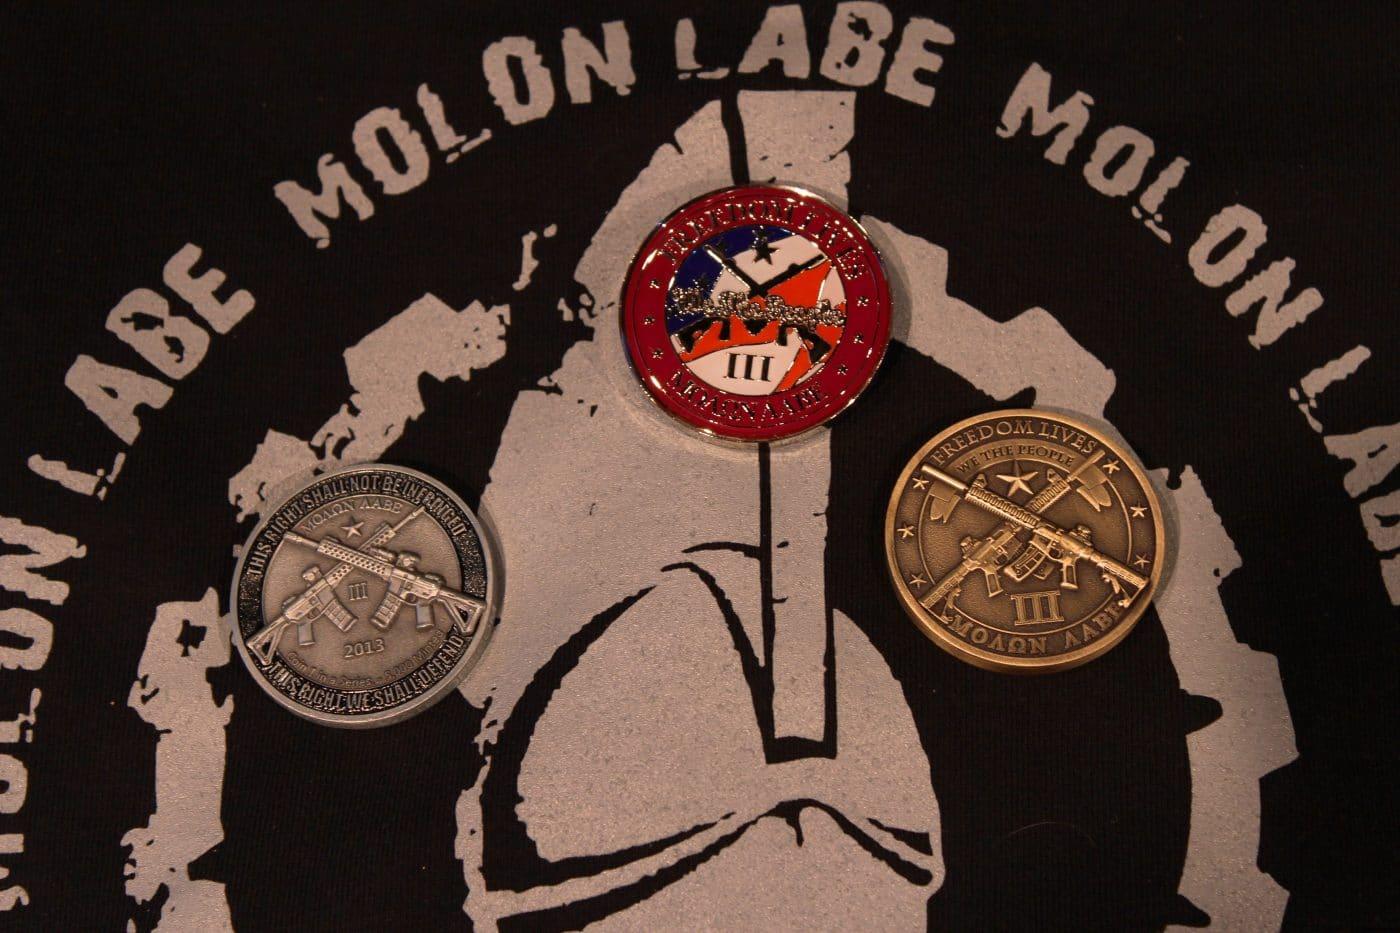 Molon-Labe-Challenge-Coins on T-Shirt